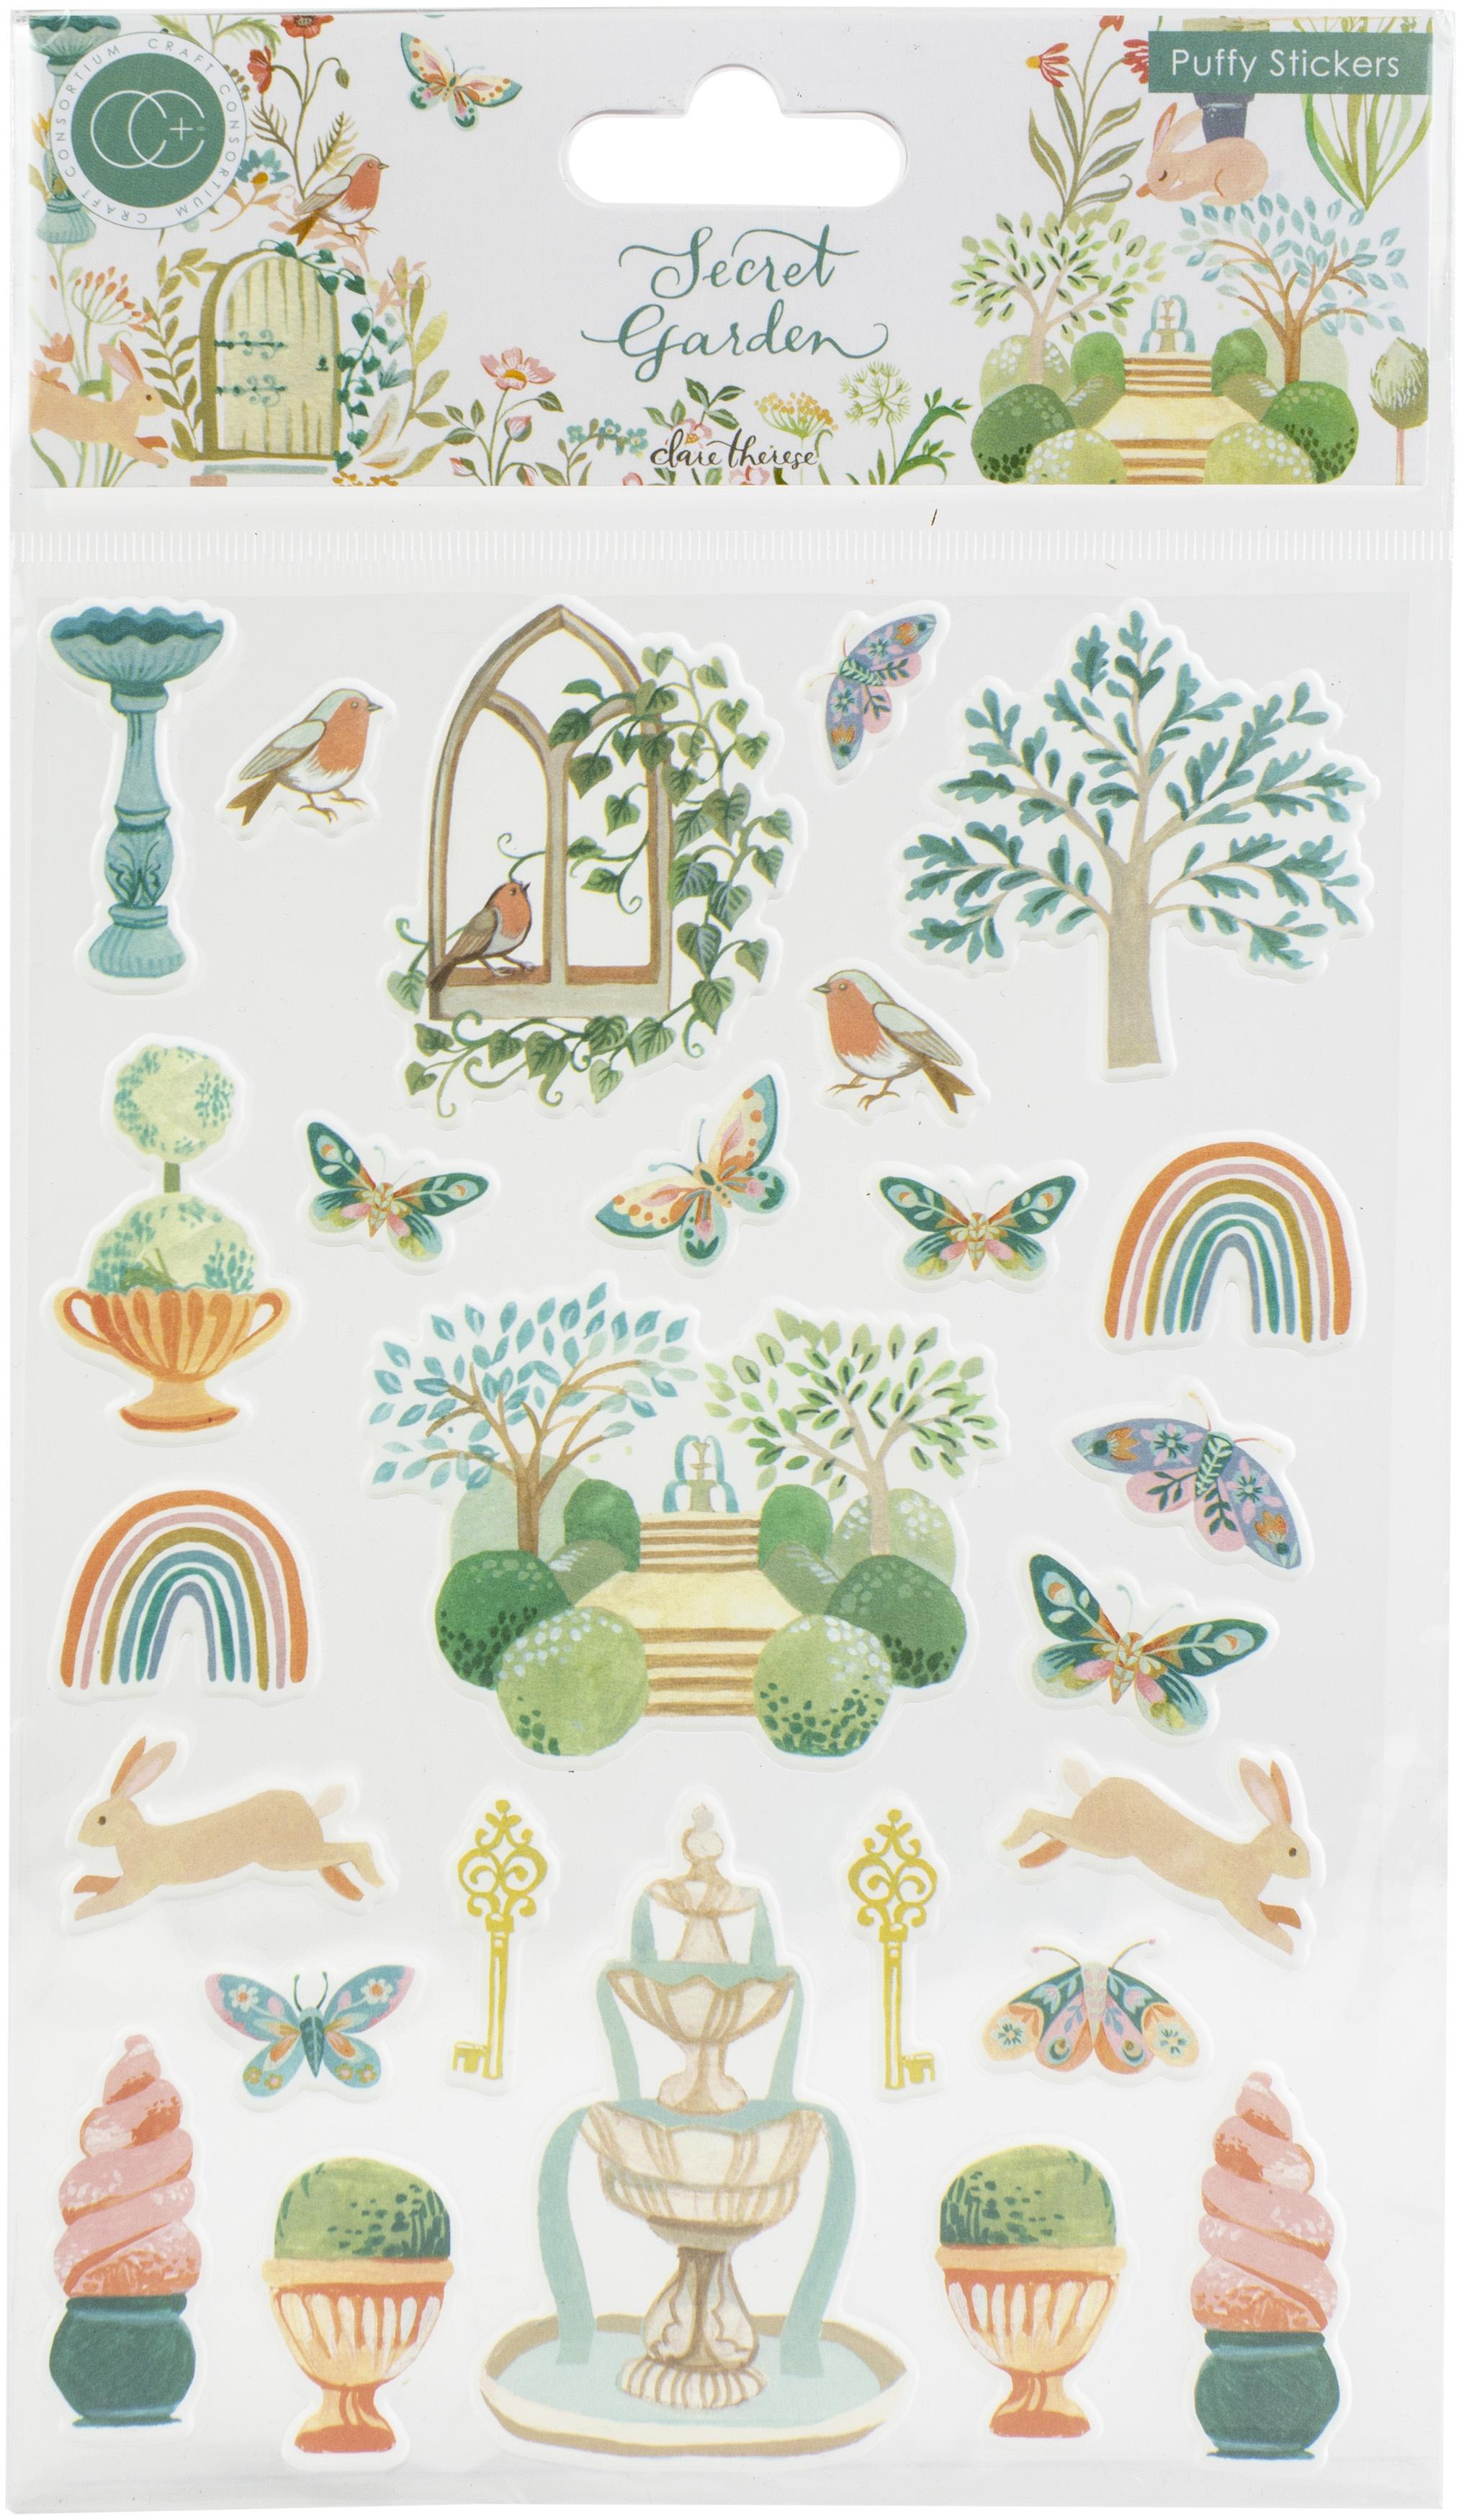 Craft Consortium - Secret Garden - Puffy Stickers